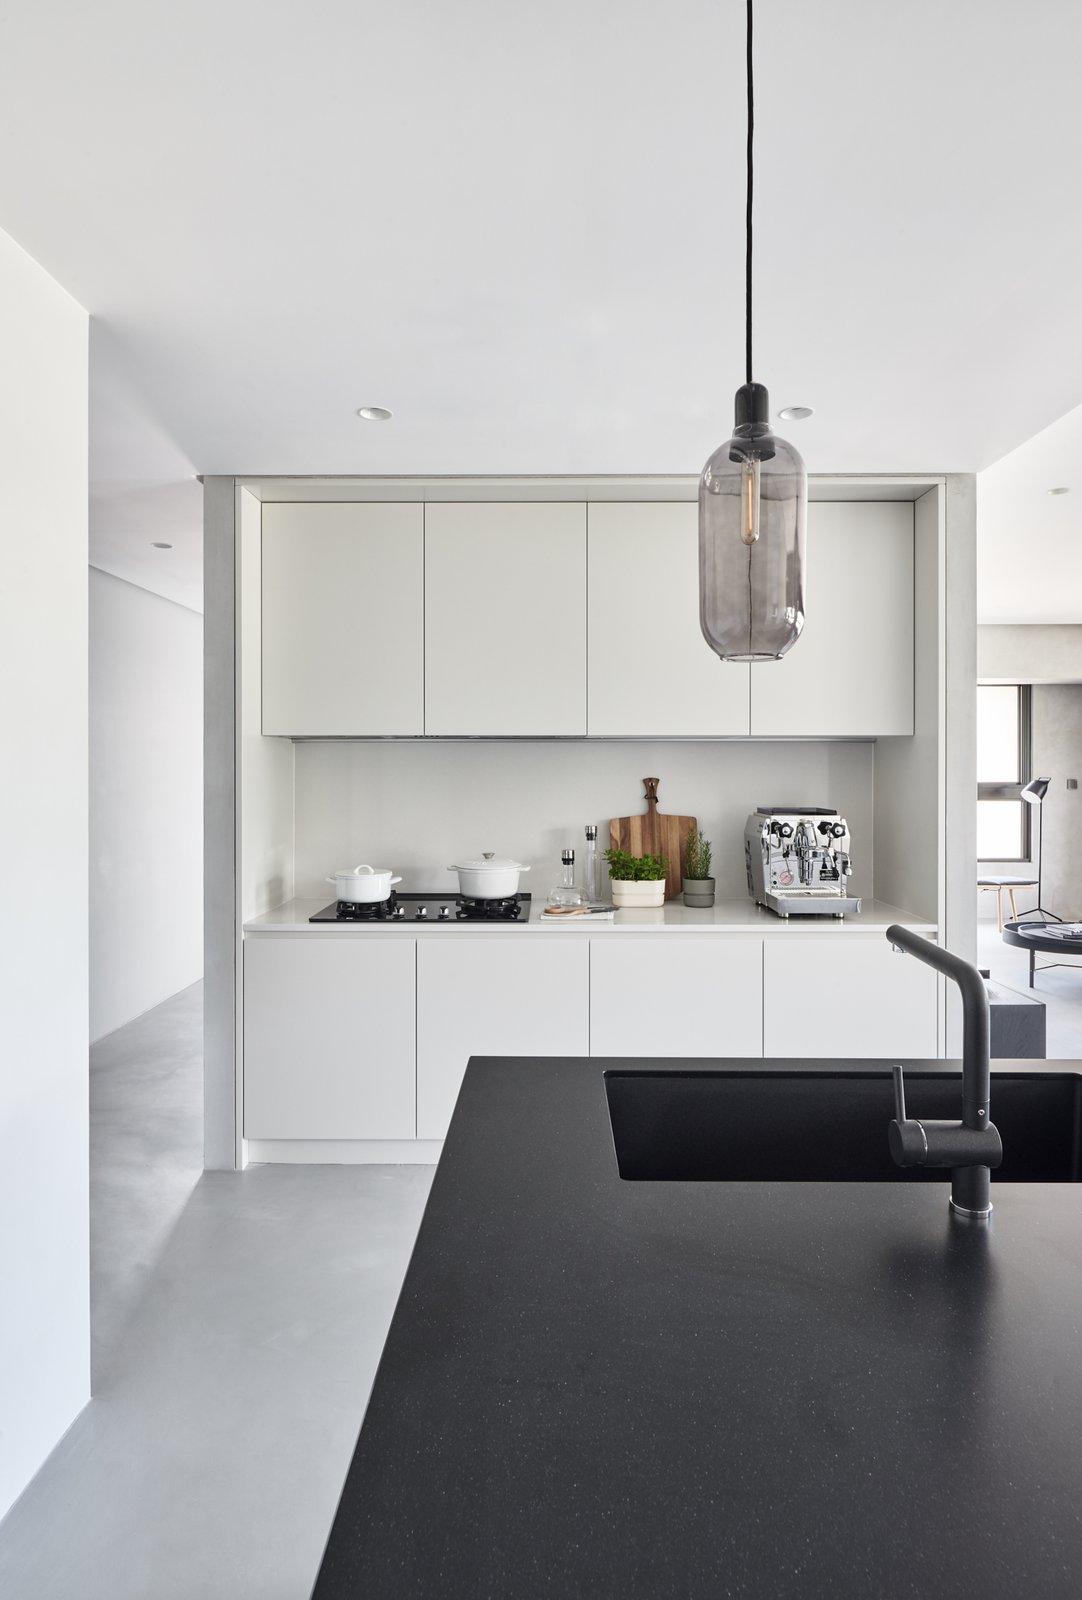 Kitchen Kitchen  Best Photos from Blackened Wood Apartment